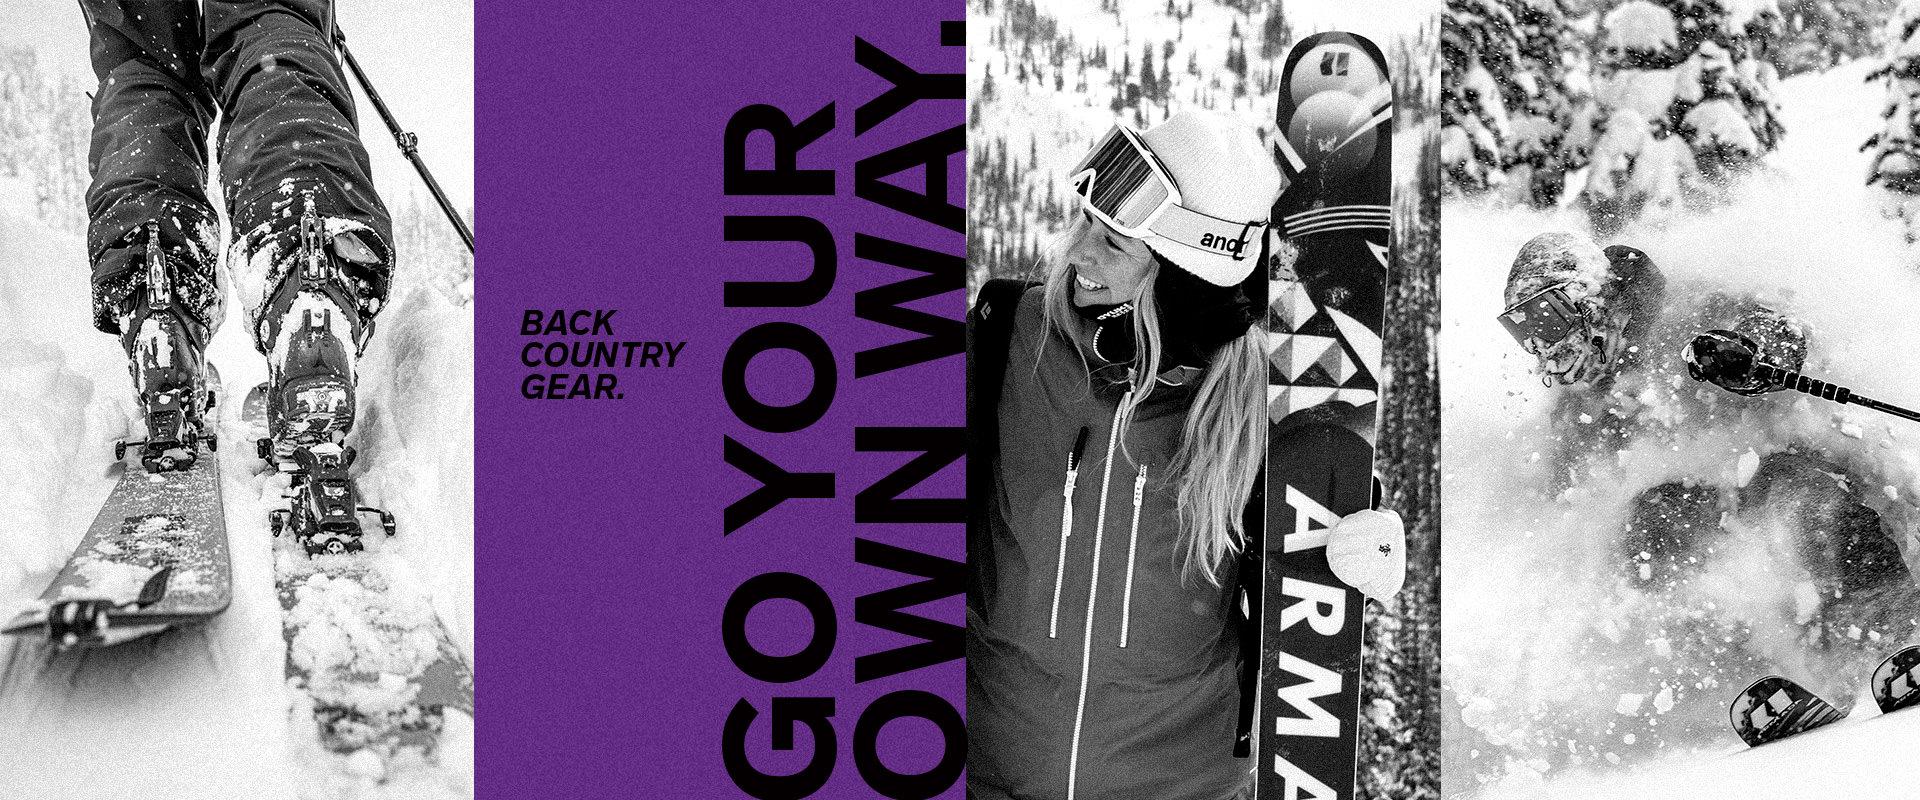 Pacos Backcountry Ski Gear